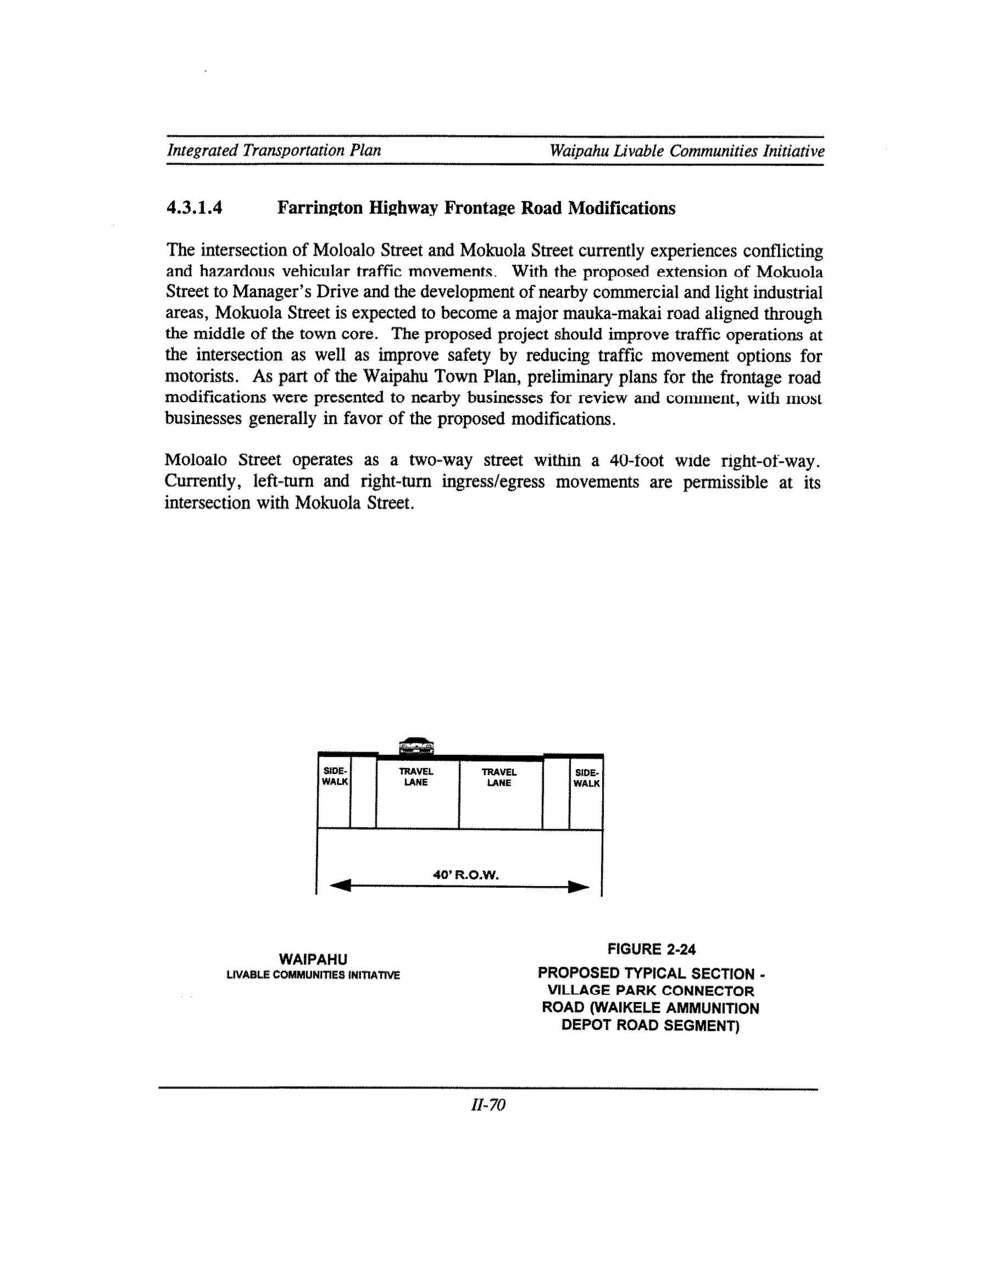 160531_WaipahuLivableCommunities(1998)_Page_085.jpg